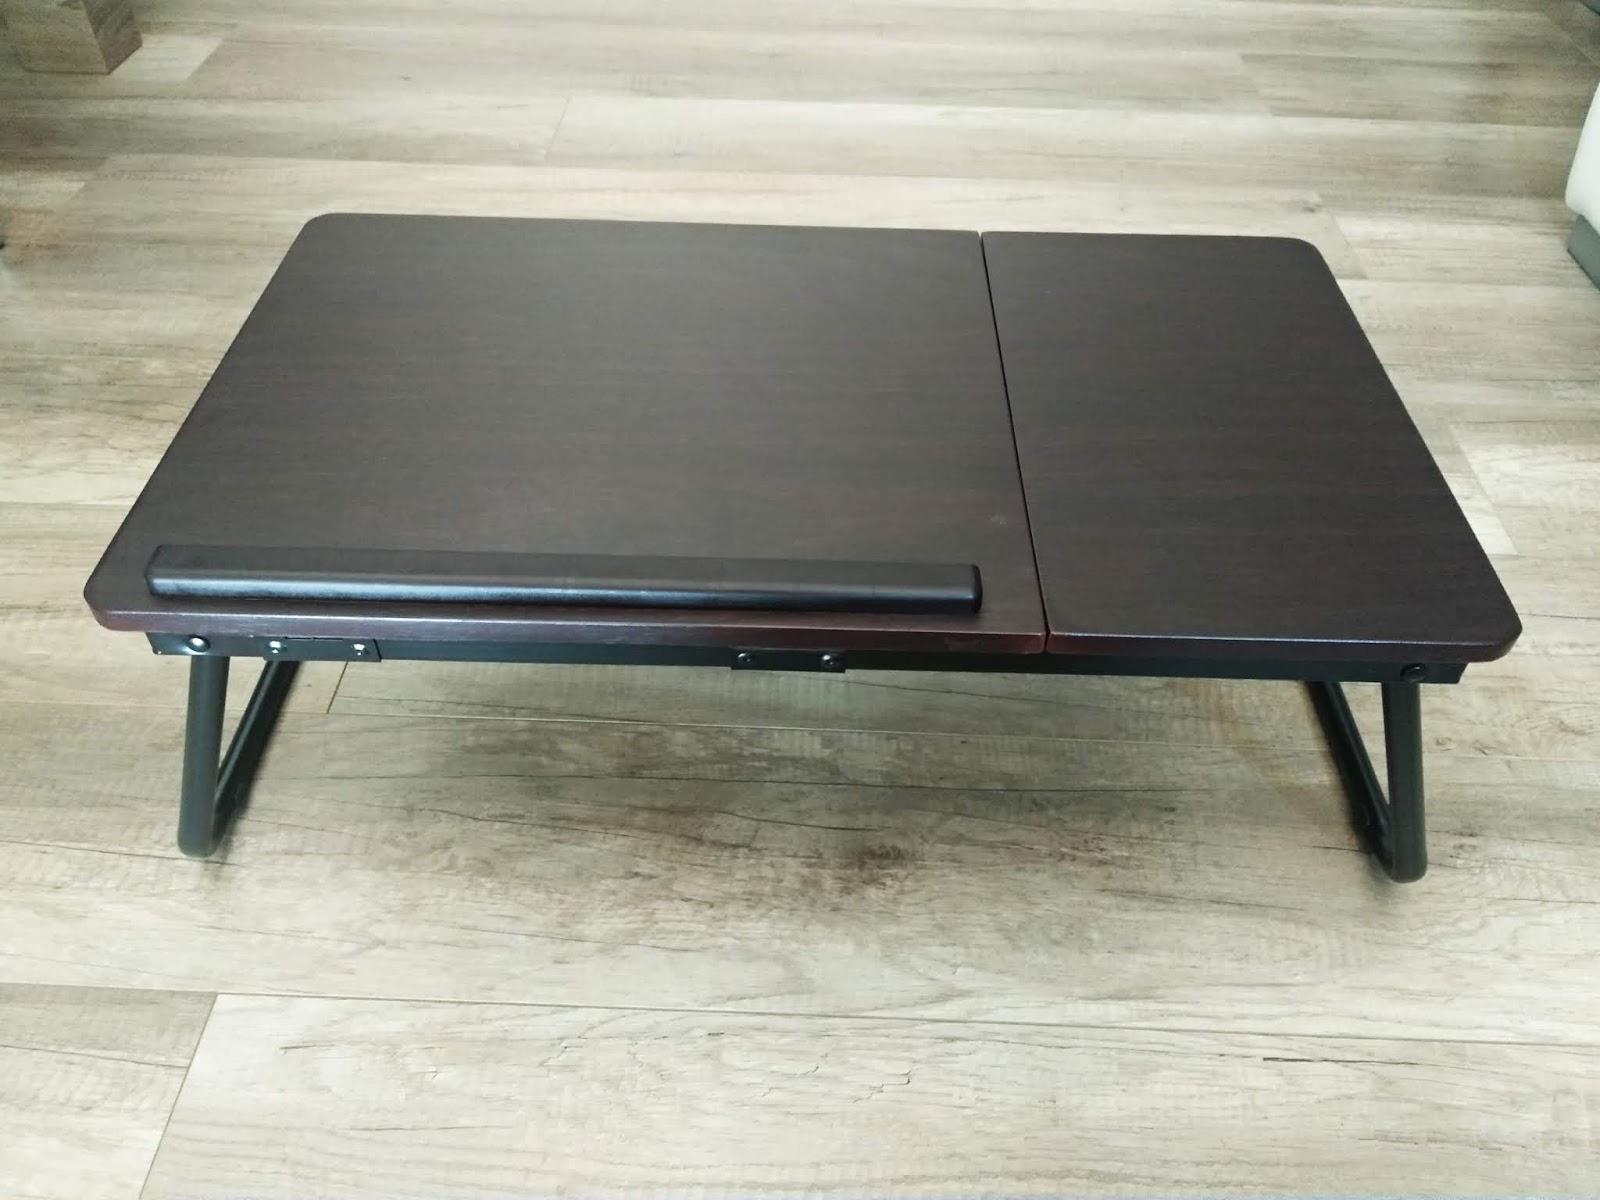 Regulowany stolik pod laptopa LAVIX - Edinos